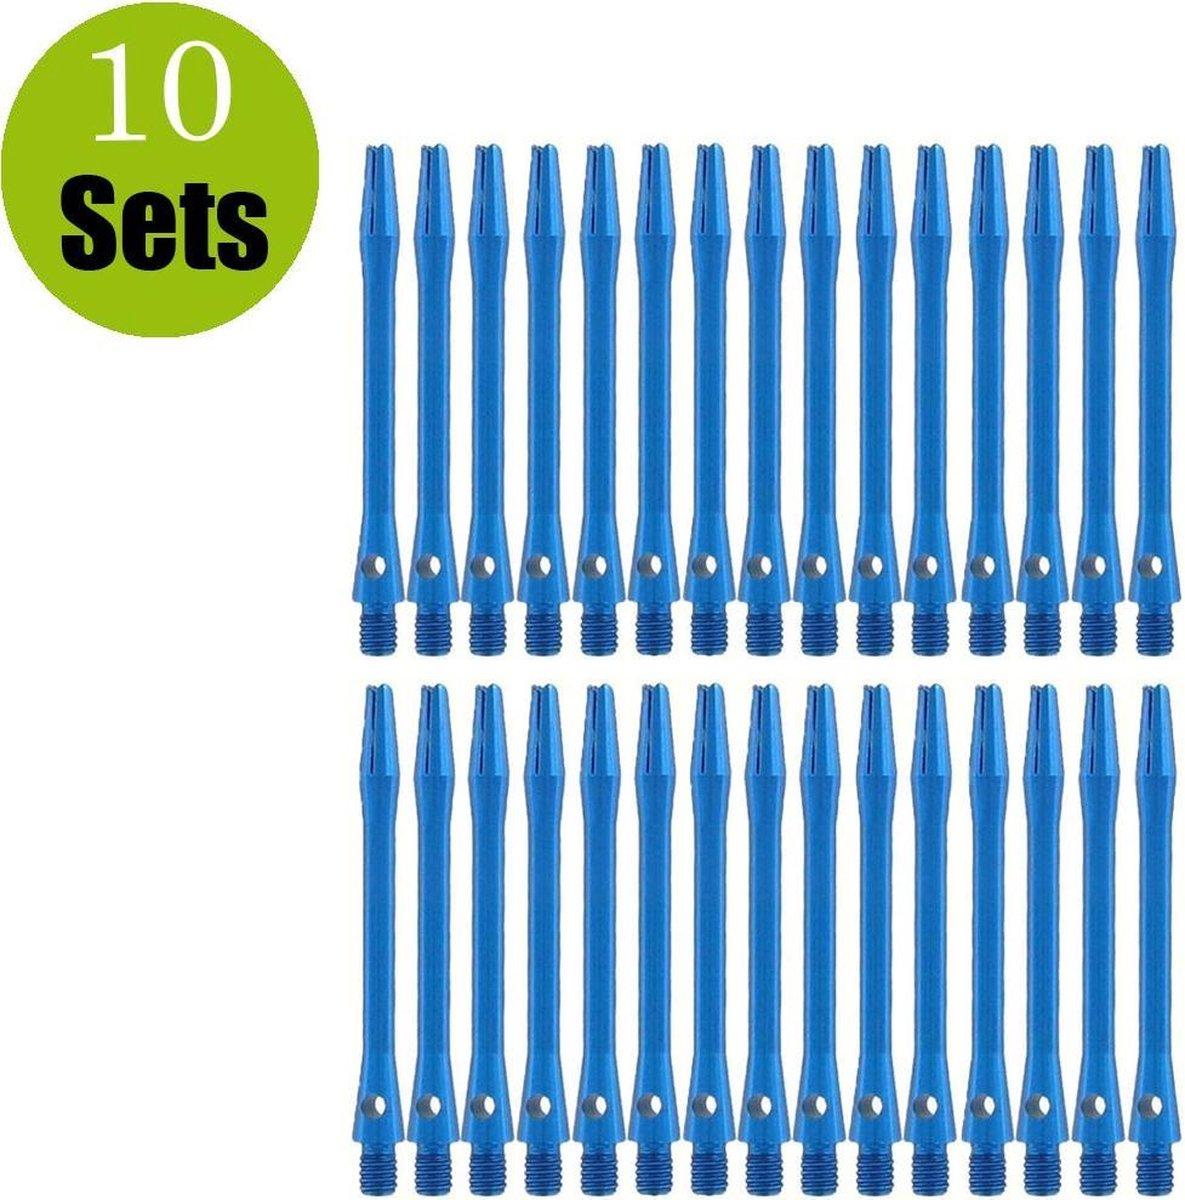 Aluminium Dart Shafts - Blauw - Short - (10 Sets)